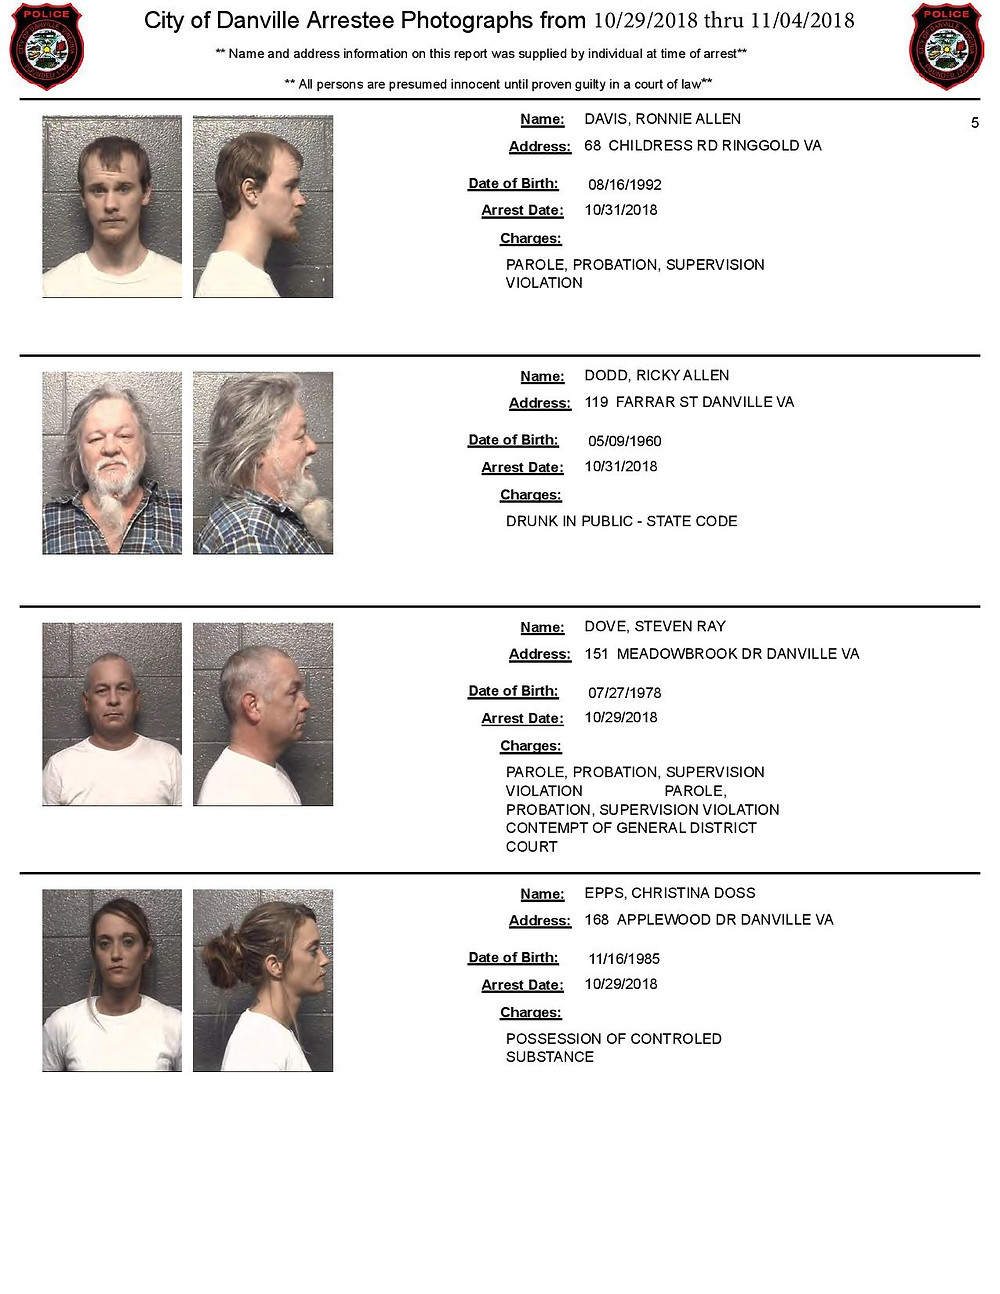 Chatham arrest photos